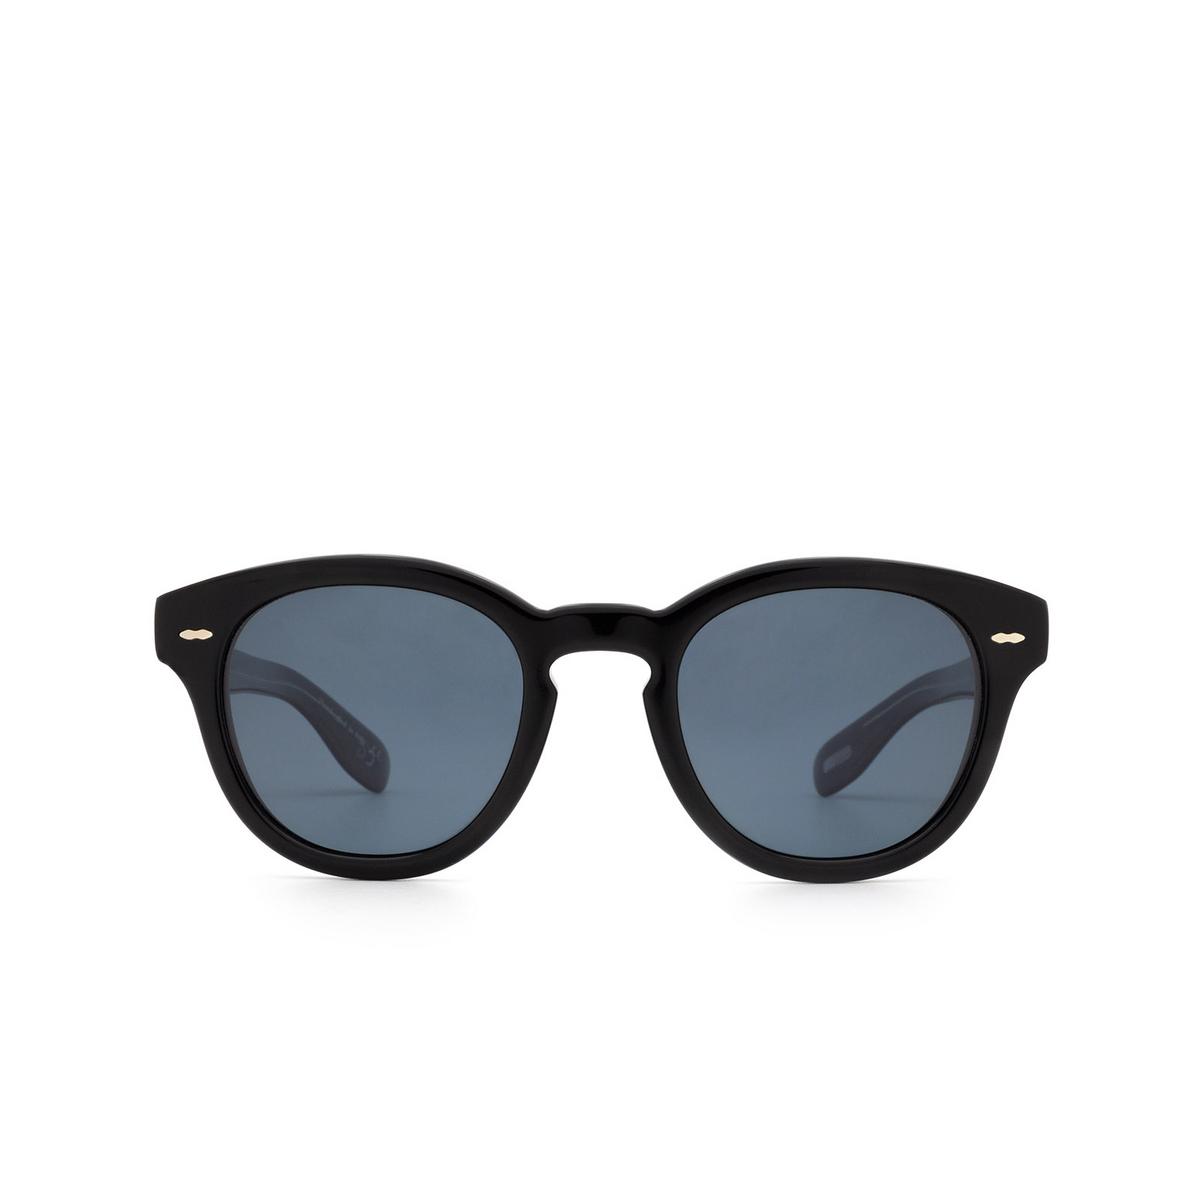 Oliver Peoples® Round Sunglasses: Cary Grant Sun OV5413SU color Black 14923R.